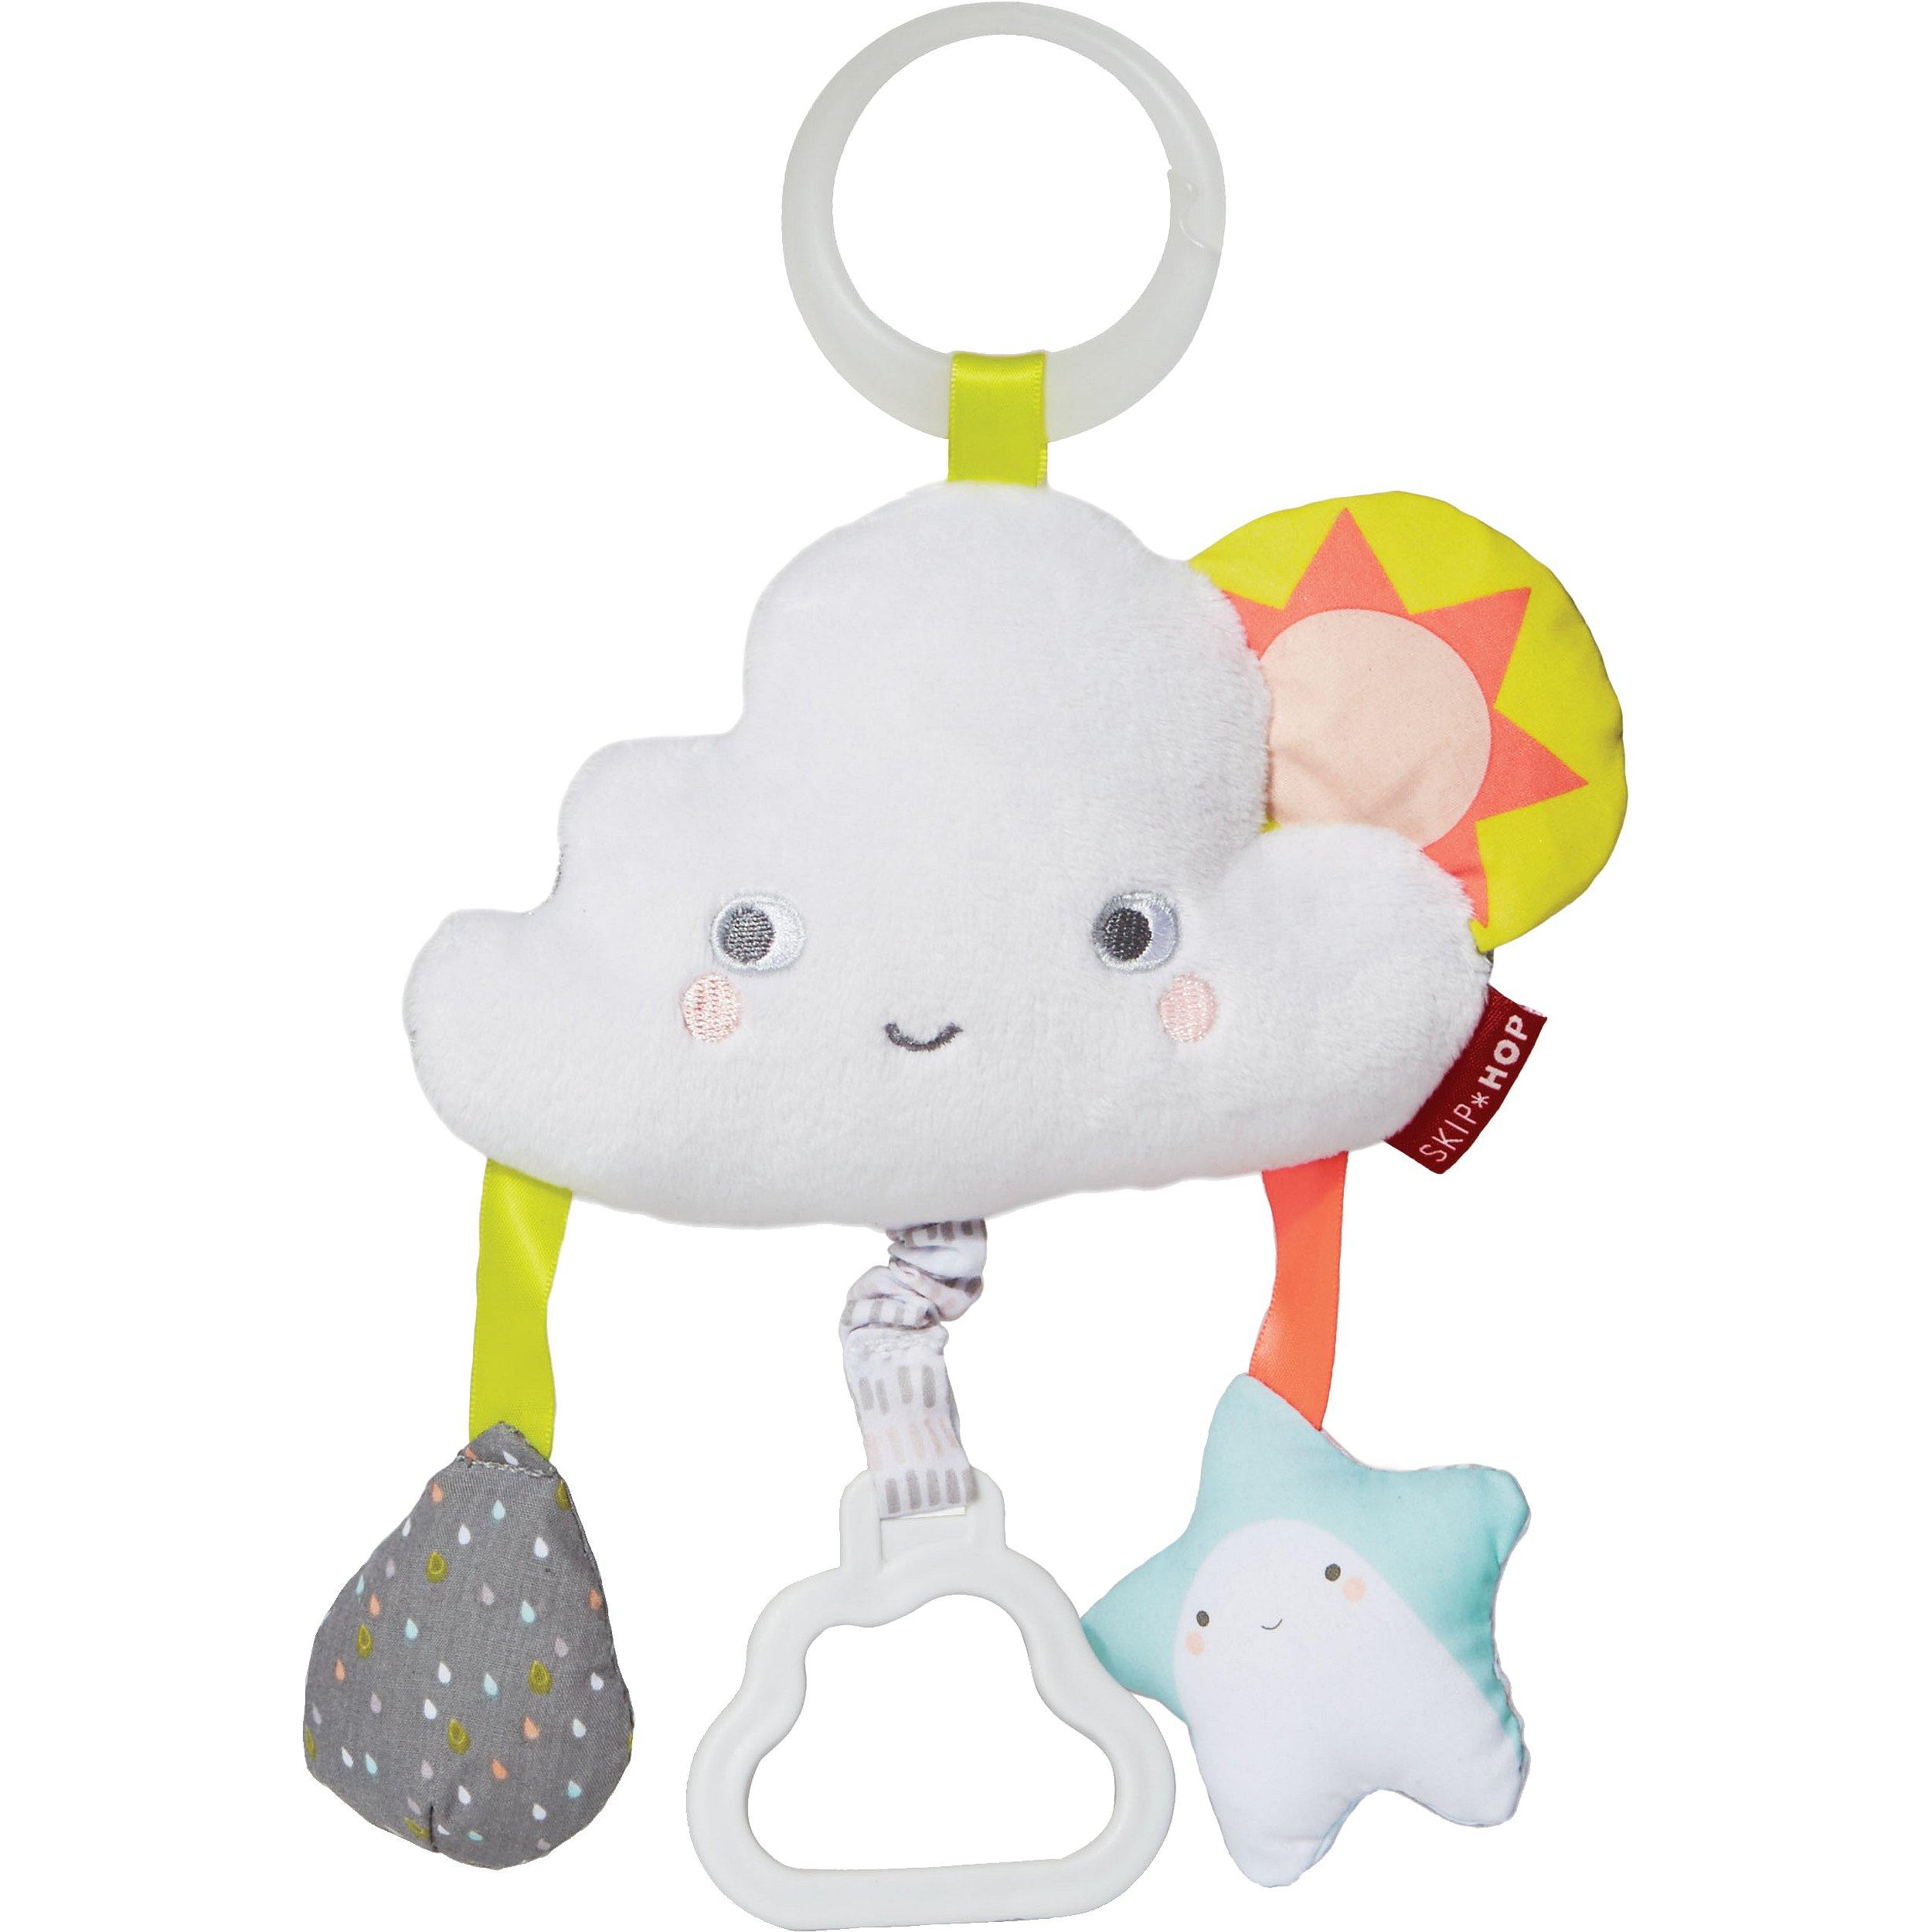 SKIP HOP Hračka na C kroužku Silver Lining Cloud Mráček 0 m+